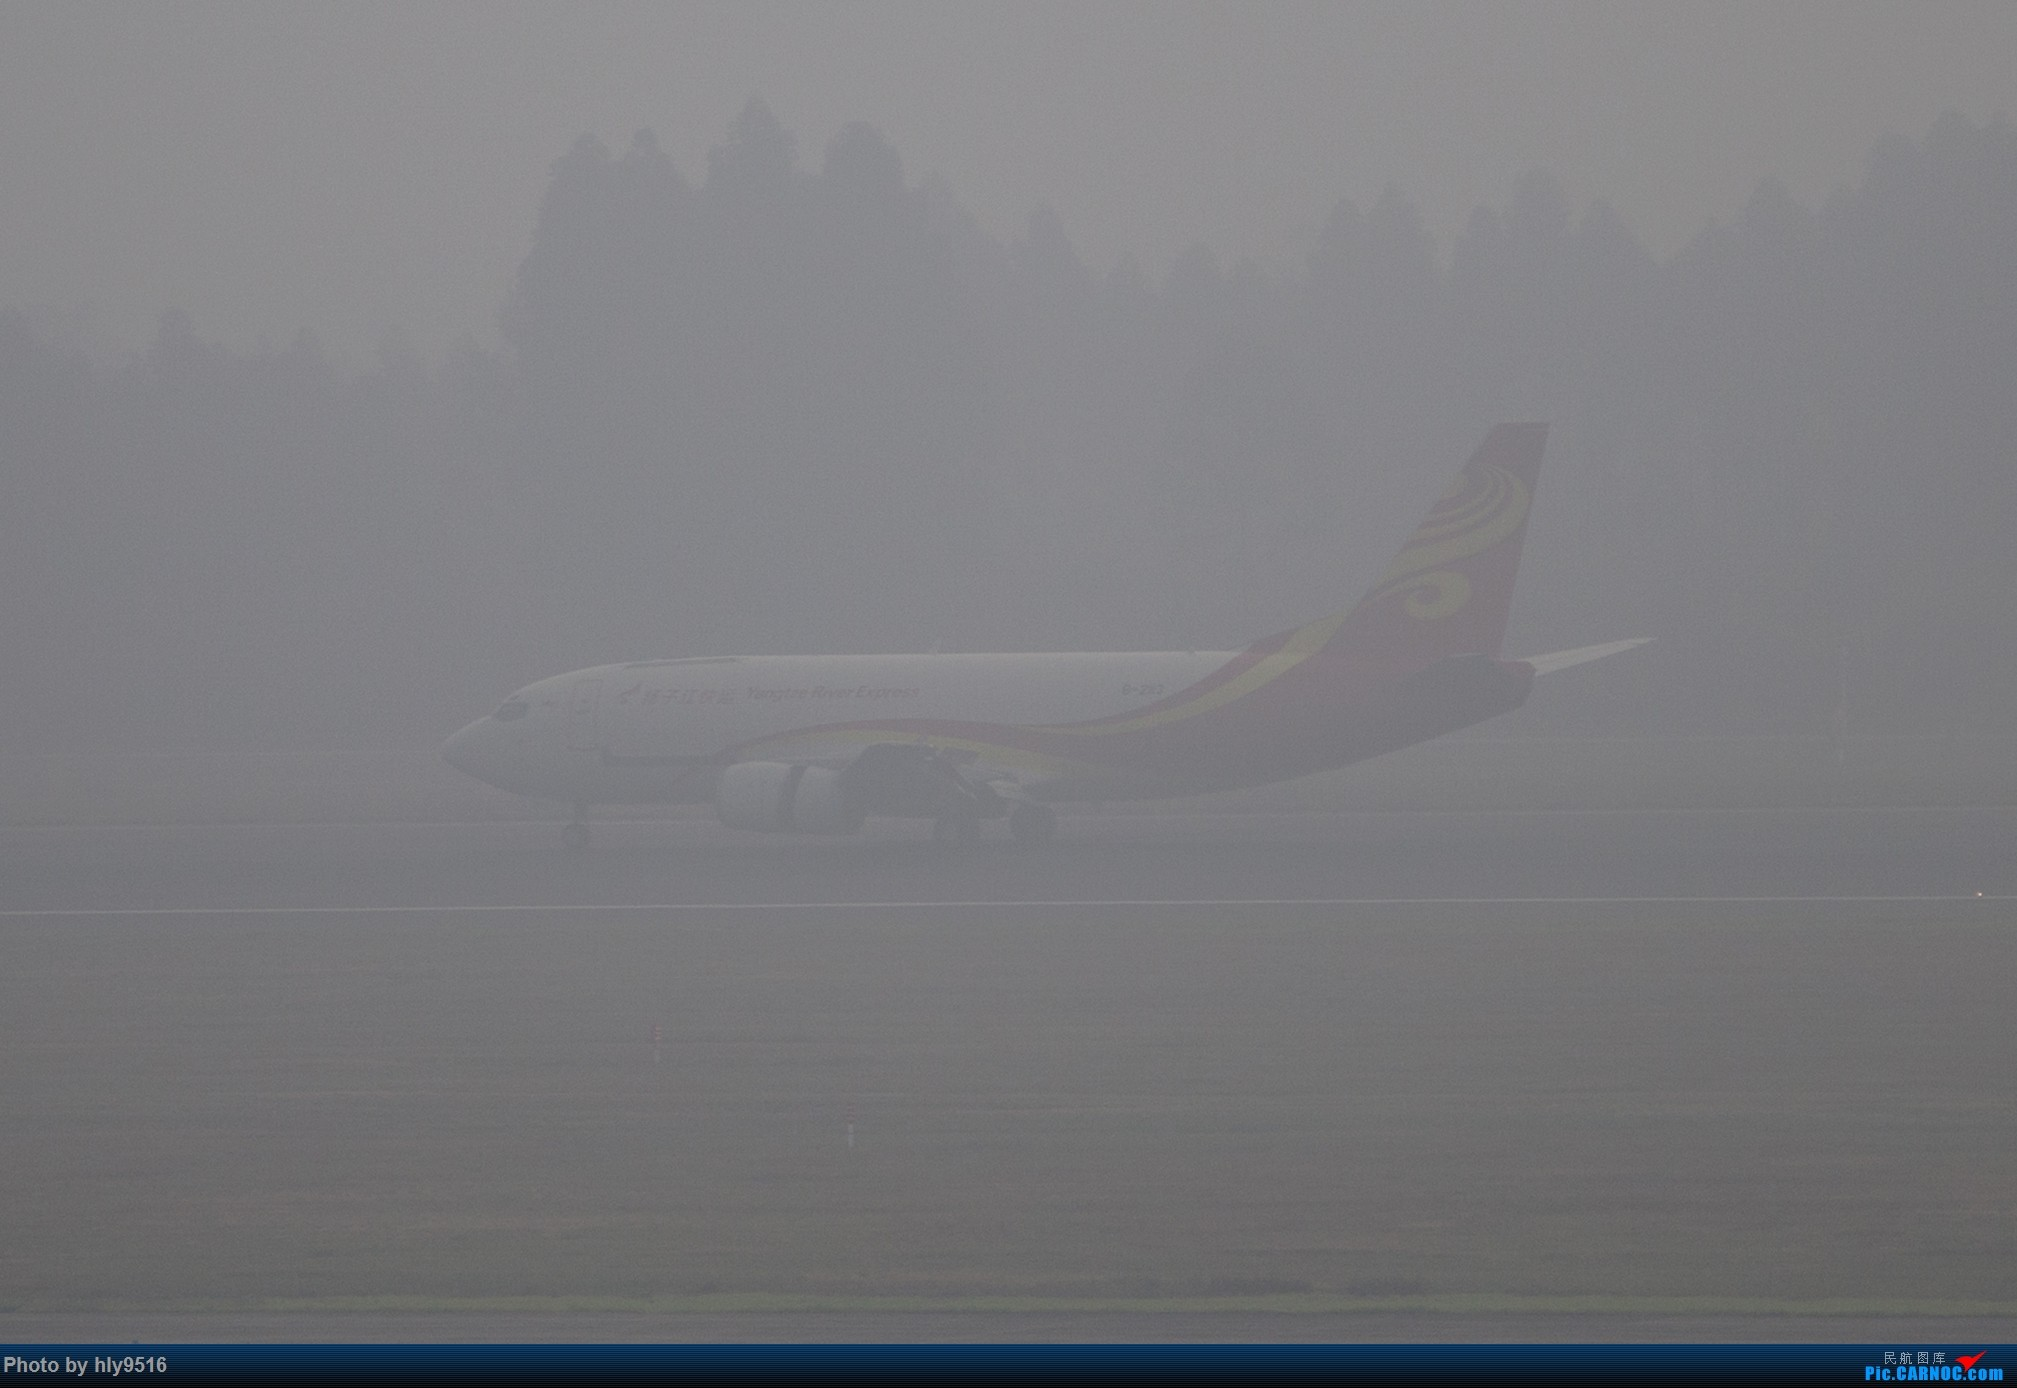 Re:[原创]【CTU】去年冬天老图一组,论成都的极致雾霾烂天 BOEING 737-300 B-2113 中国成都双流国际机场